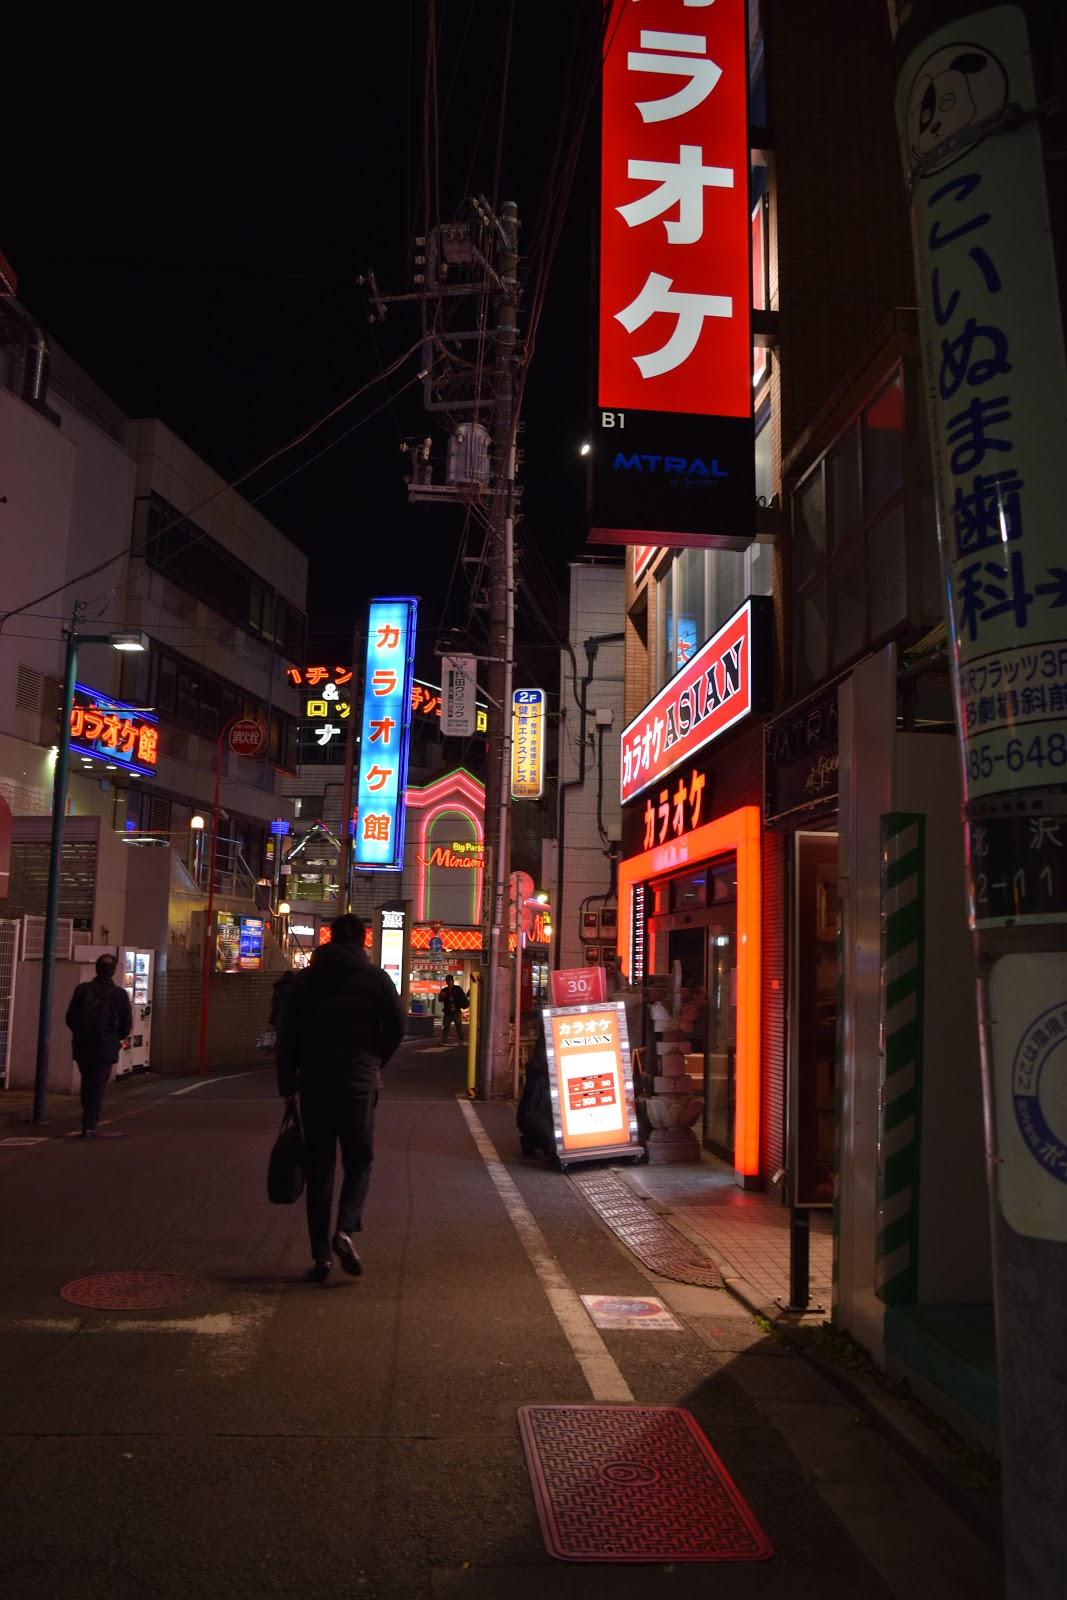 Neon signs at night in Shimokitazawa Tokyo